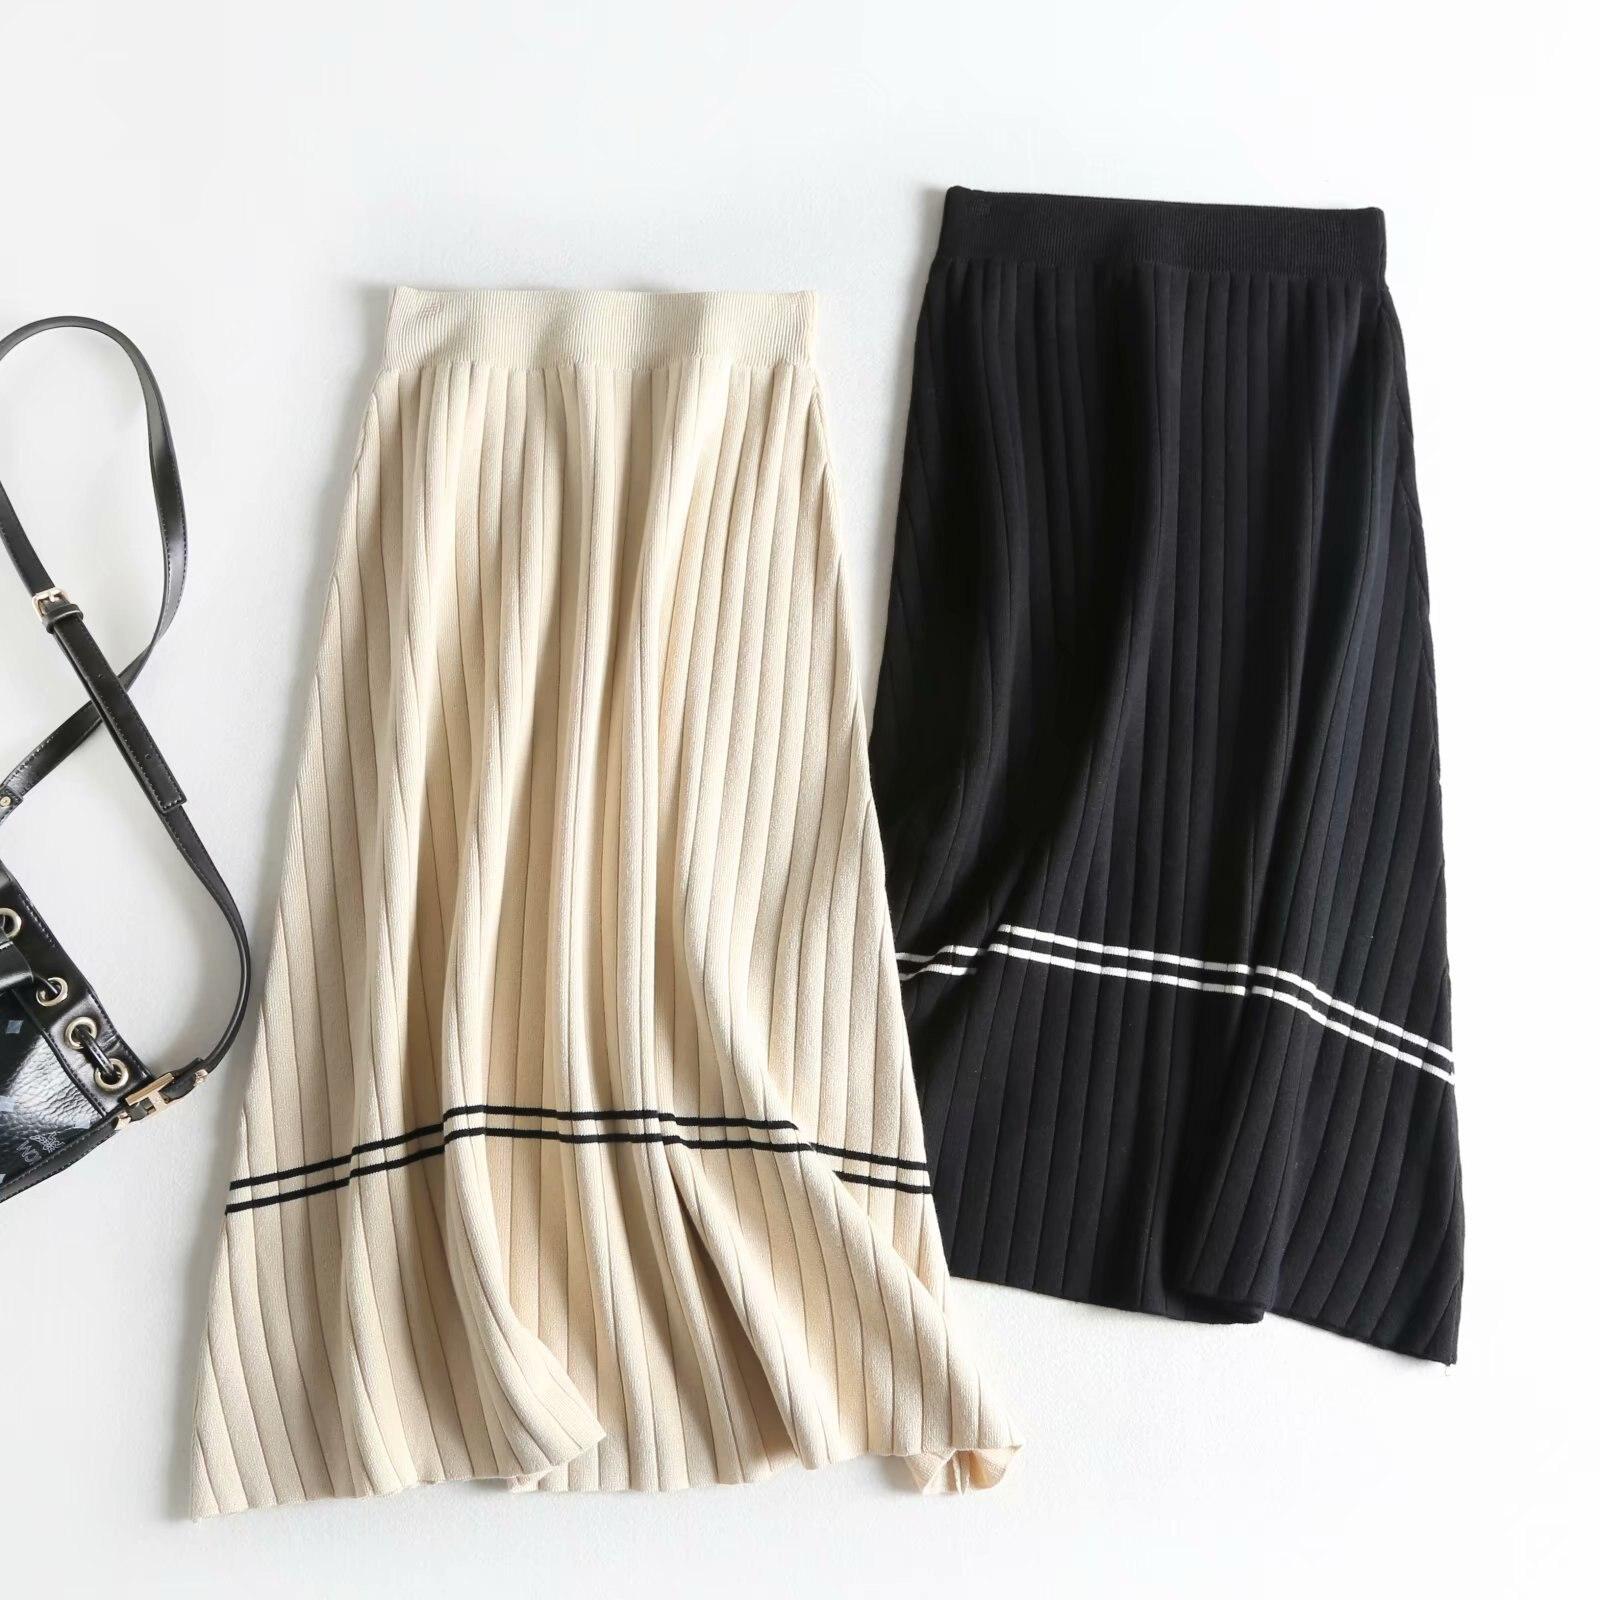 High Waist Women Spring Skirts Vintage Knitting Women Long Skirt Faldas Jupe Femme Women Beige Black Skirt Saia